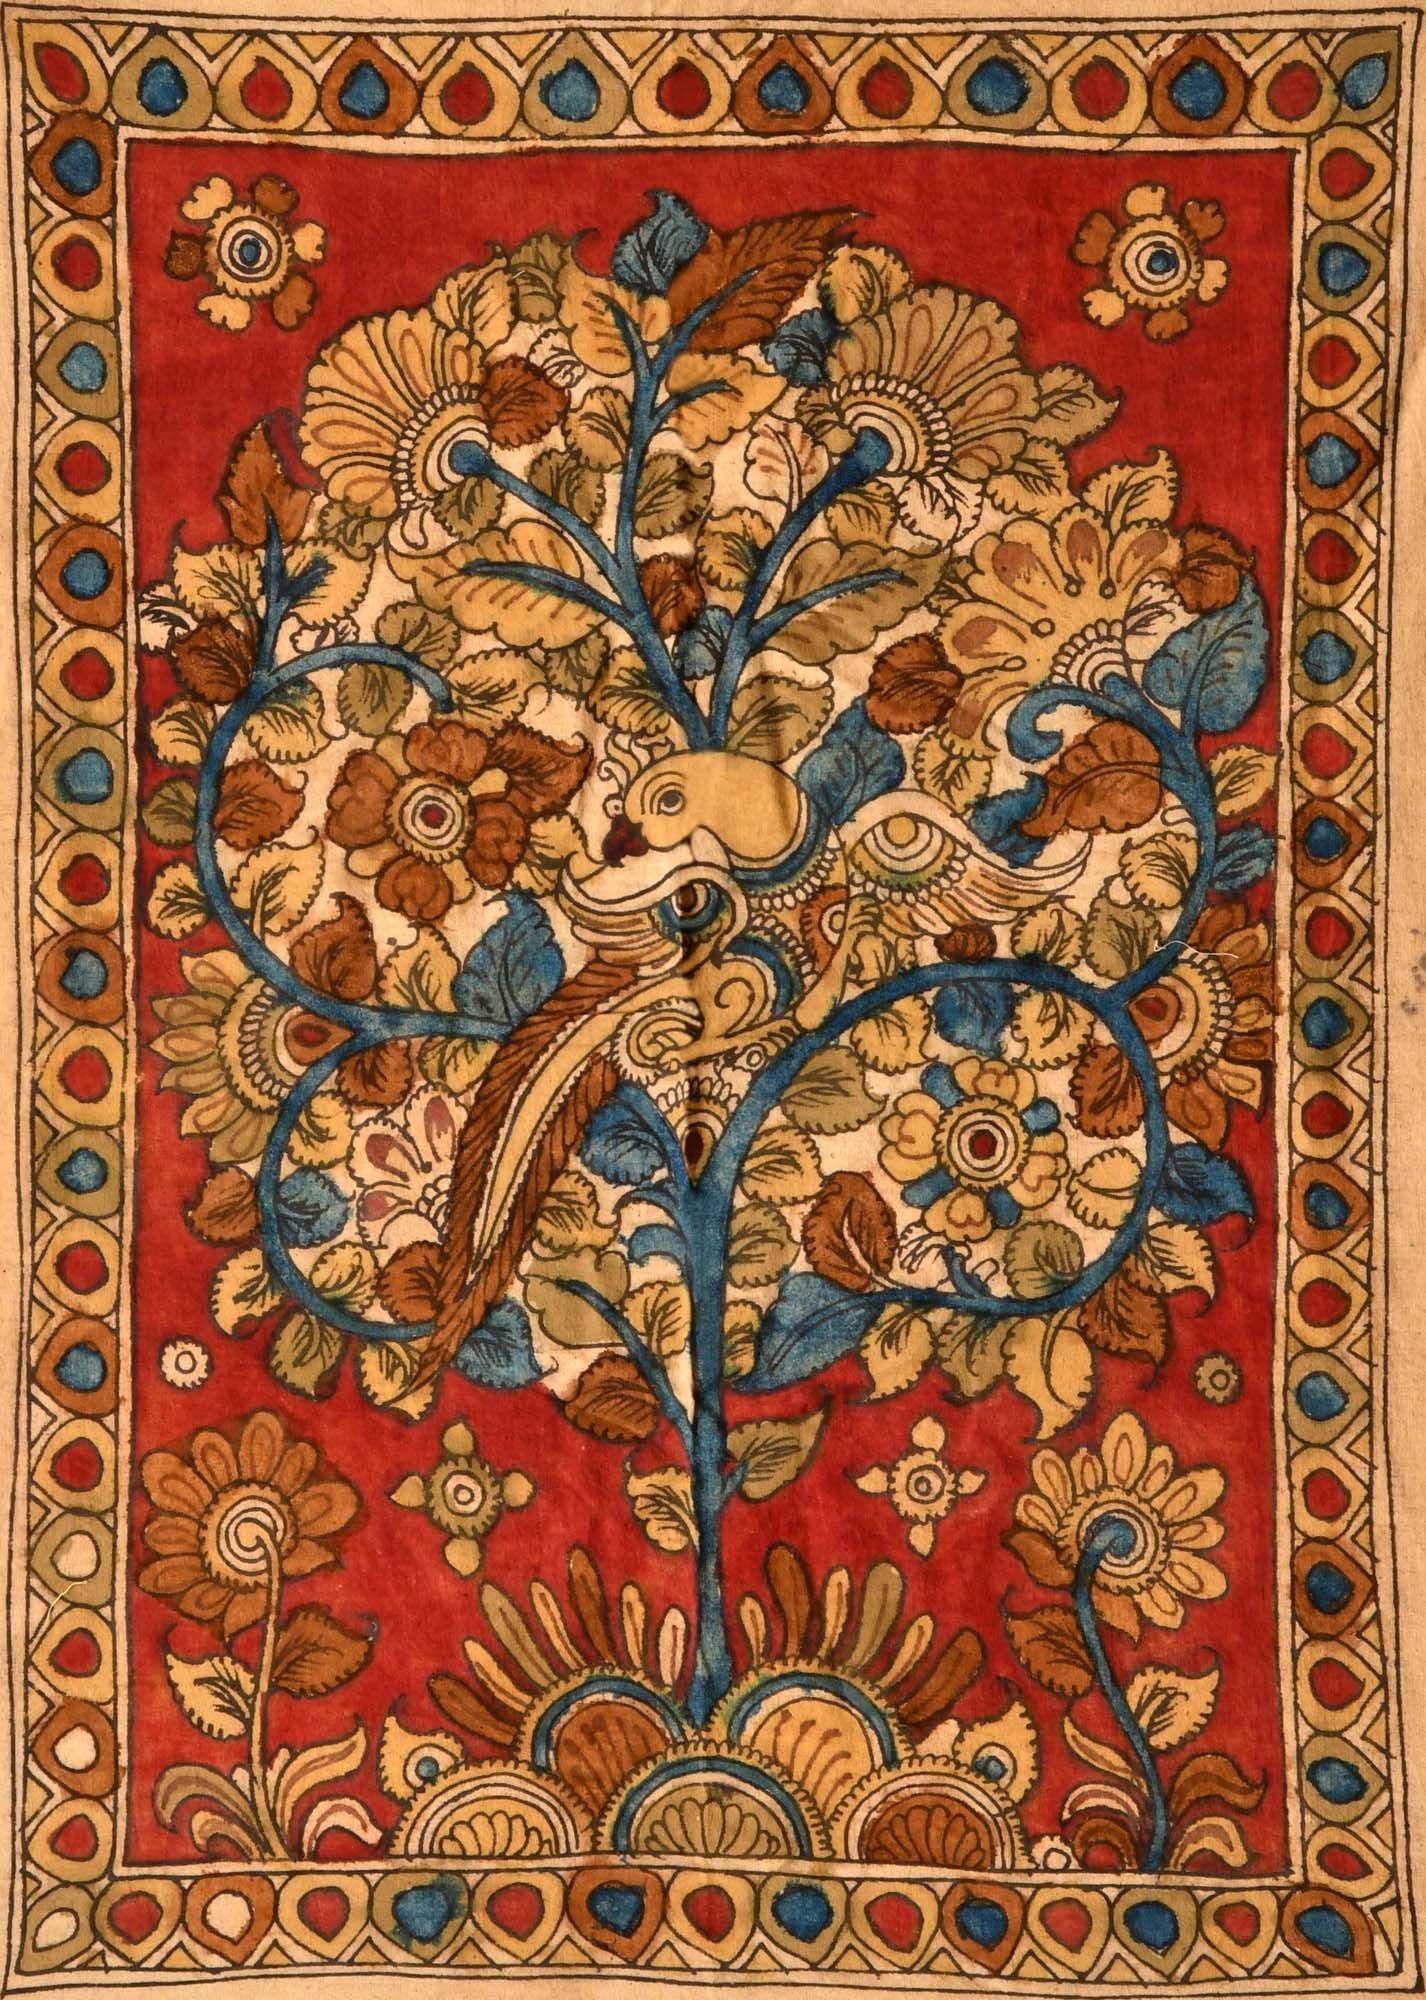 Tree of Life - Kalamkari Painting on Cotton